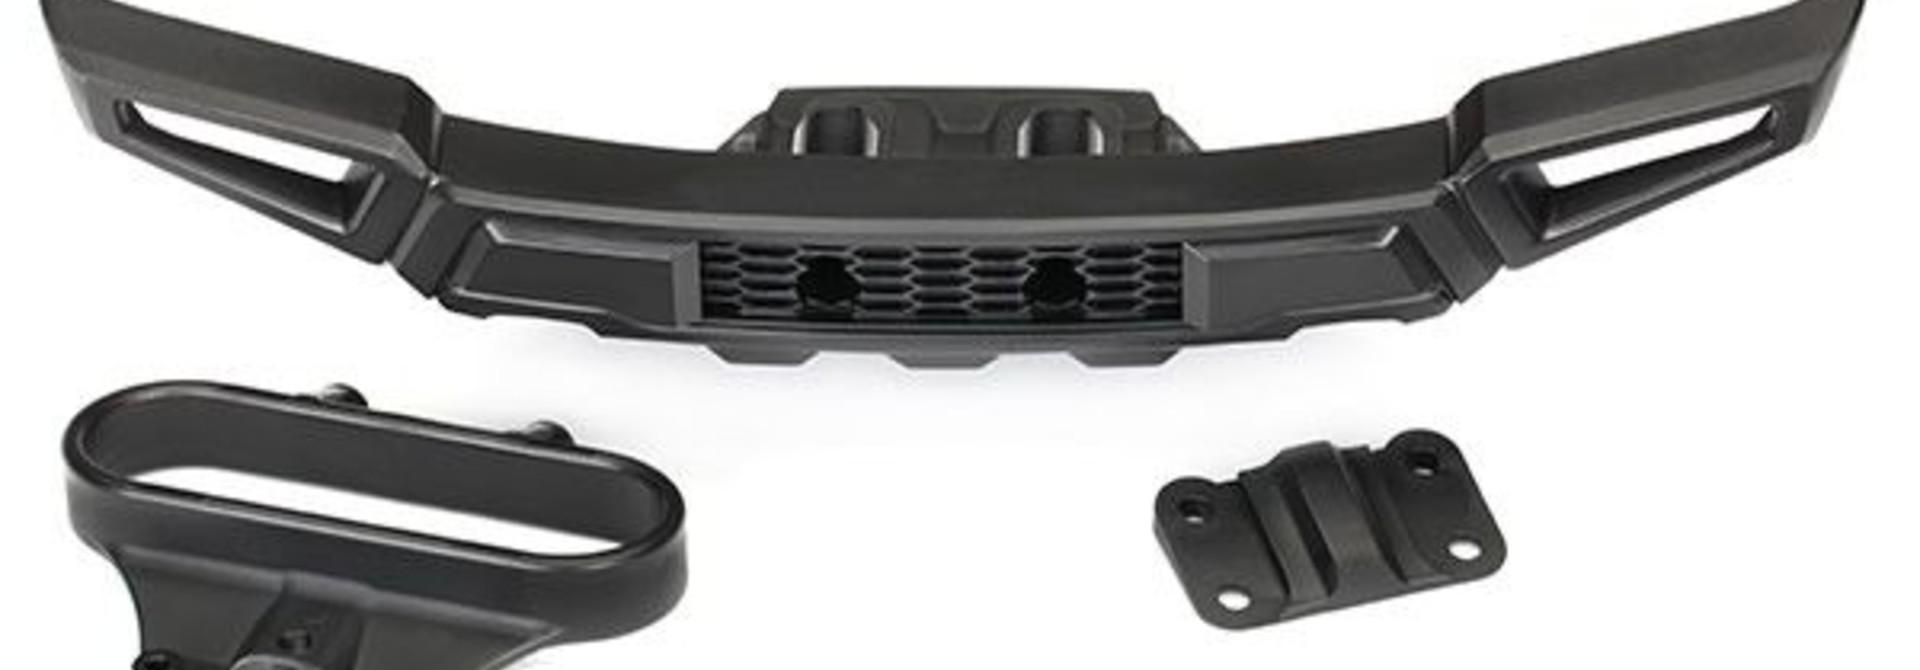 Bumper, Front/ Bumper Mount, Front/ Adapter (Fits 2017 Ford, TRX5834